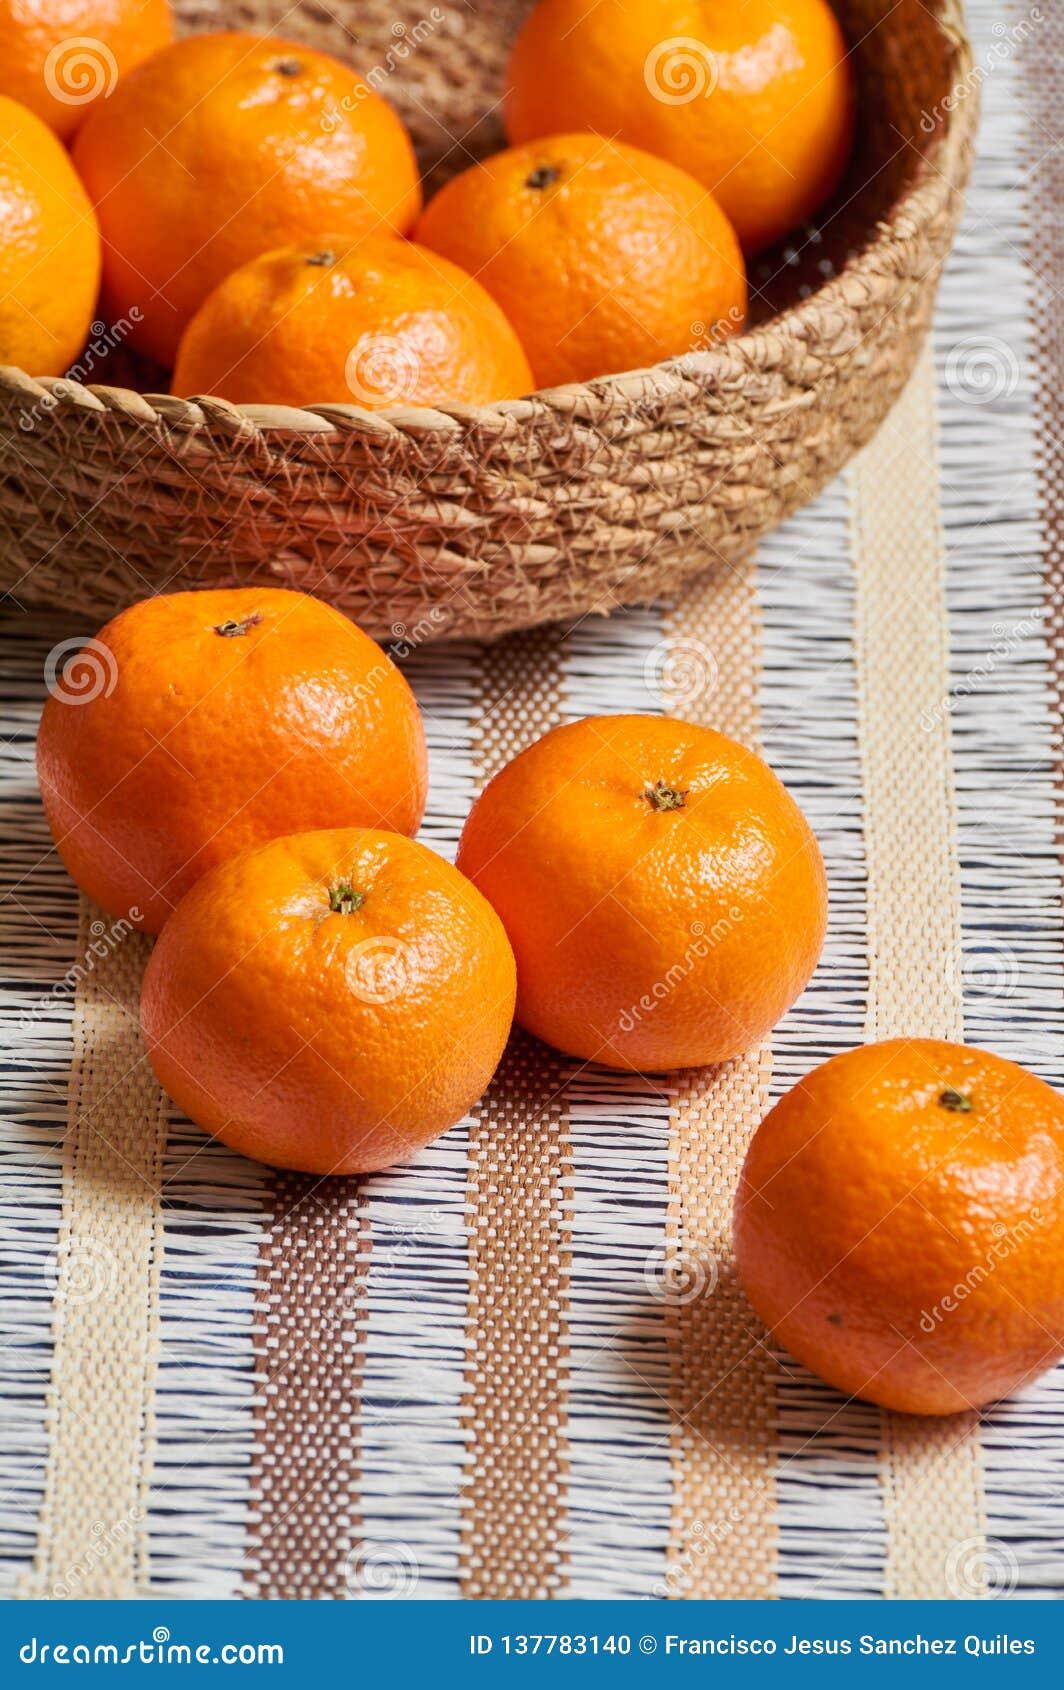 Tangerine χειροτεχνικό υπόβαθρο τραπεζομάντιλων καλαθιών